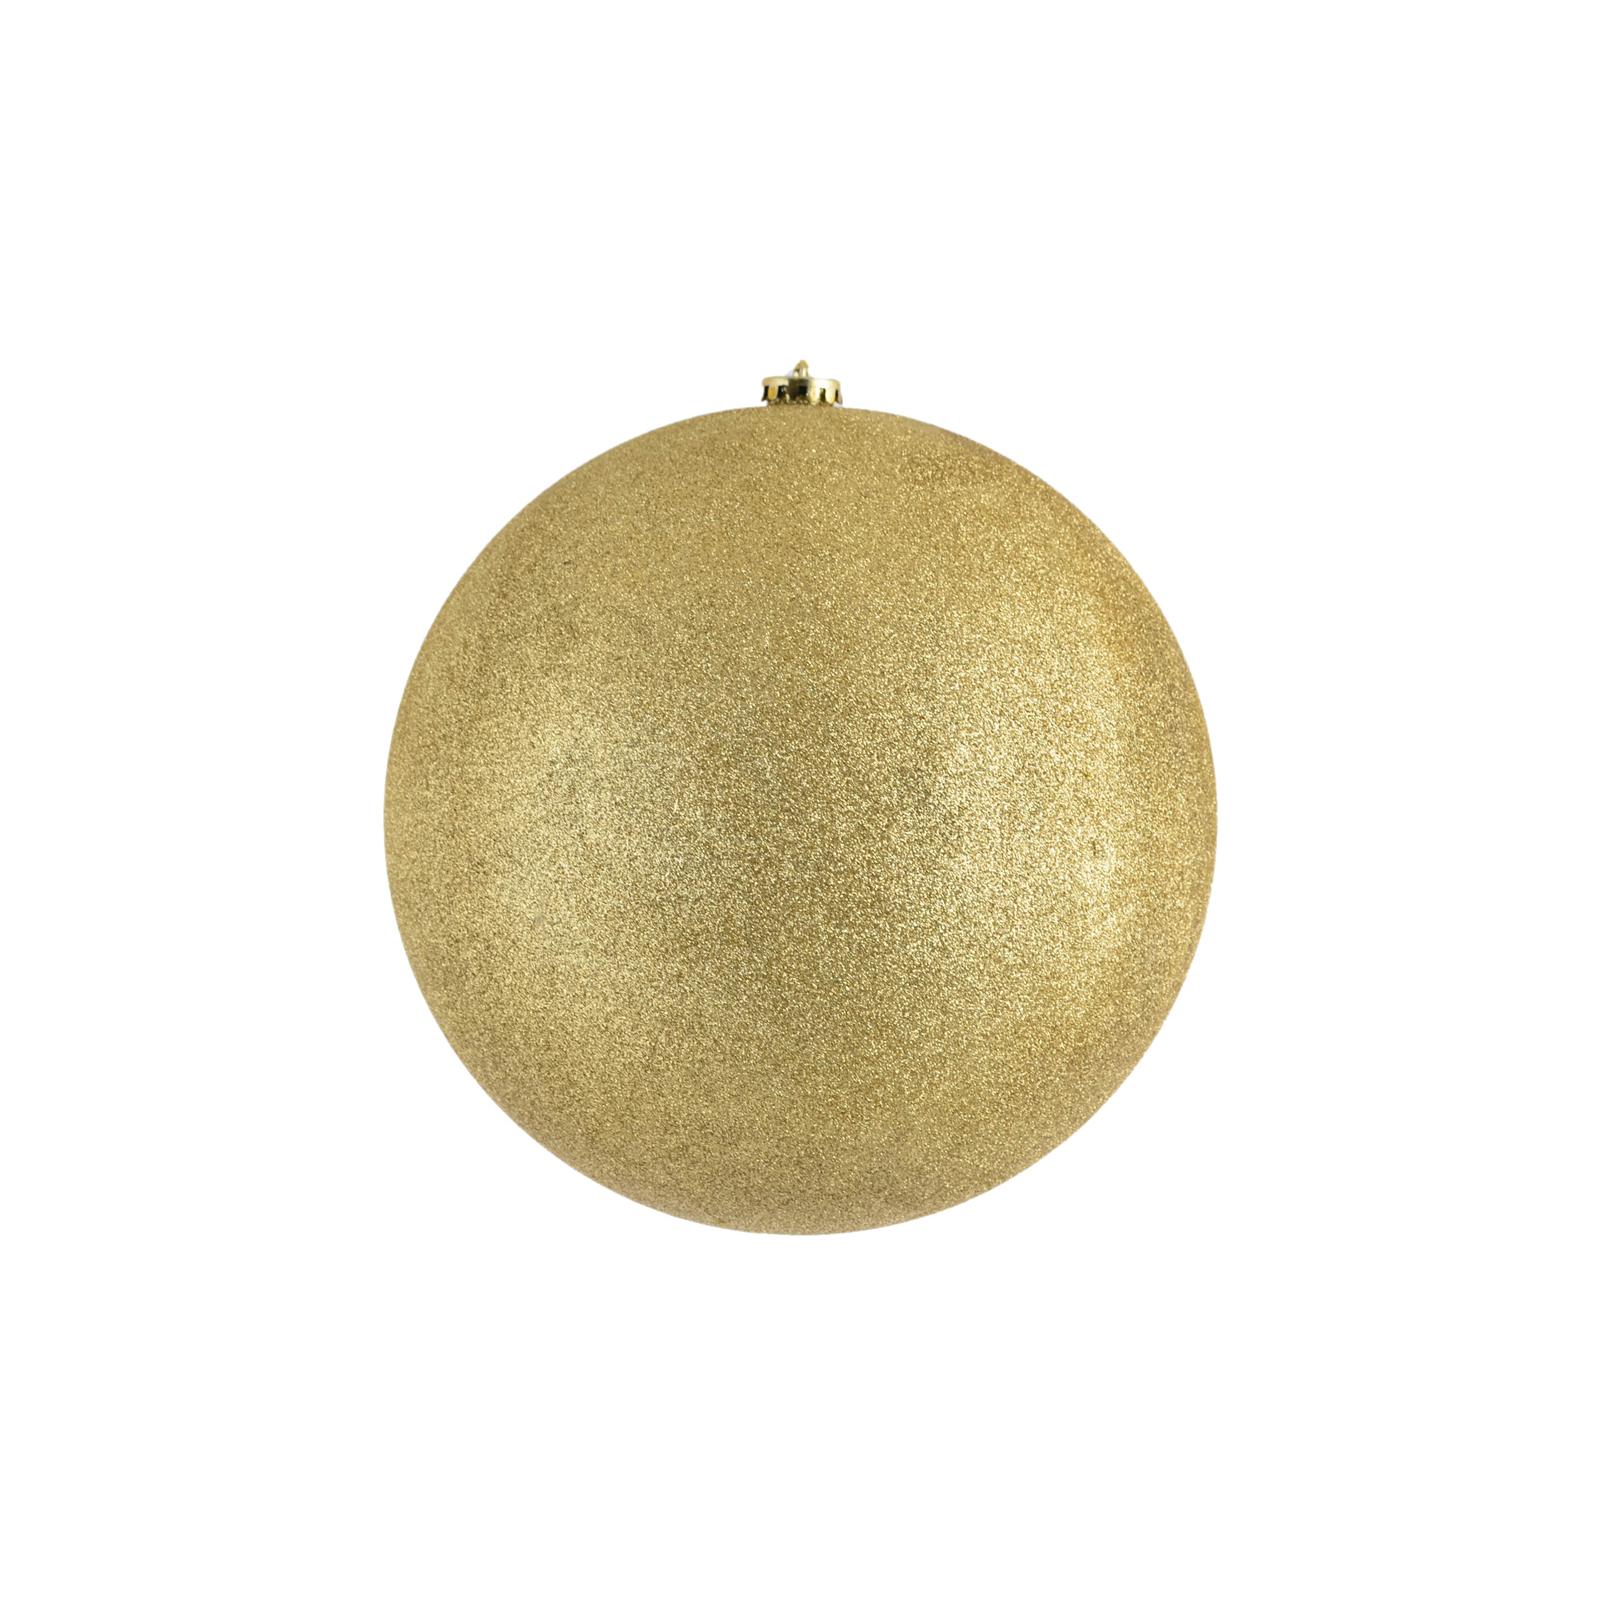 Елочная игрушка YES! Fun Шар d-25 см золотой глиттер (972675)